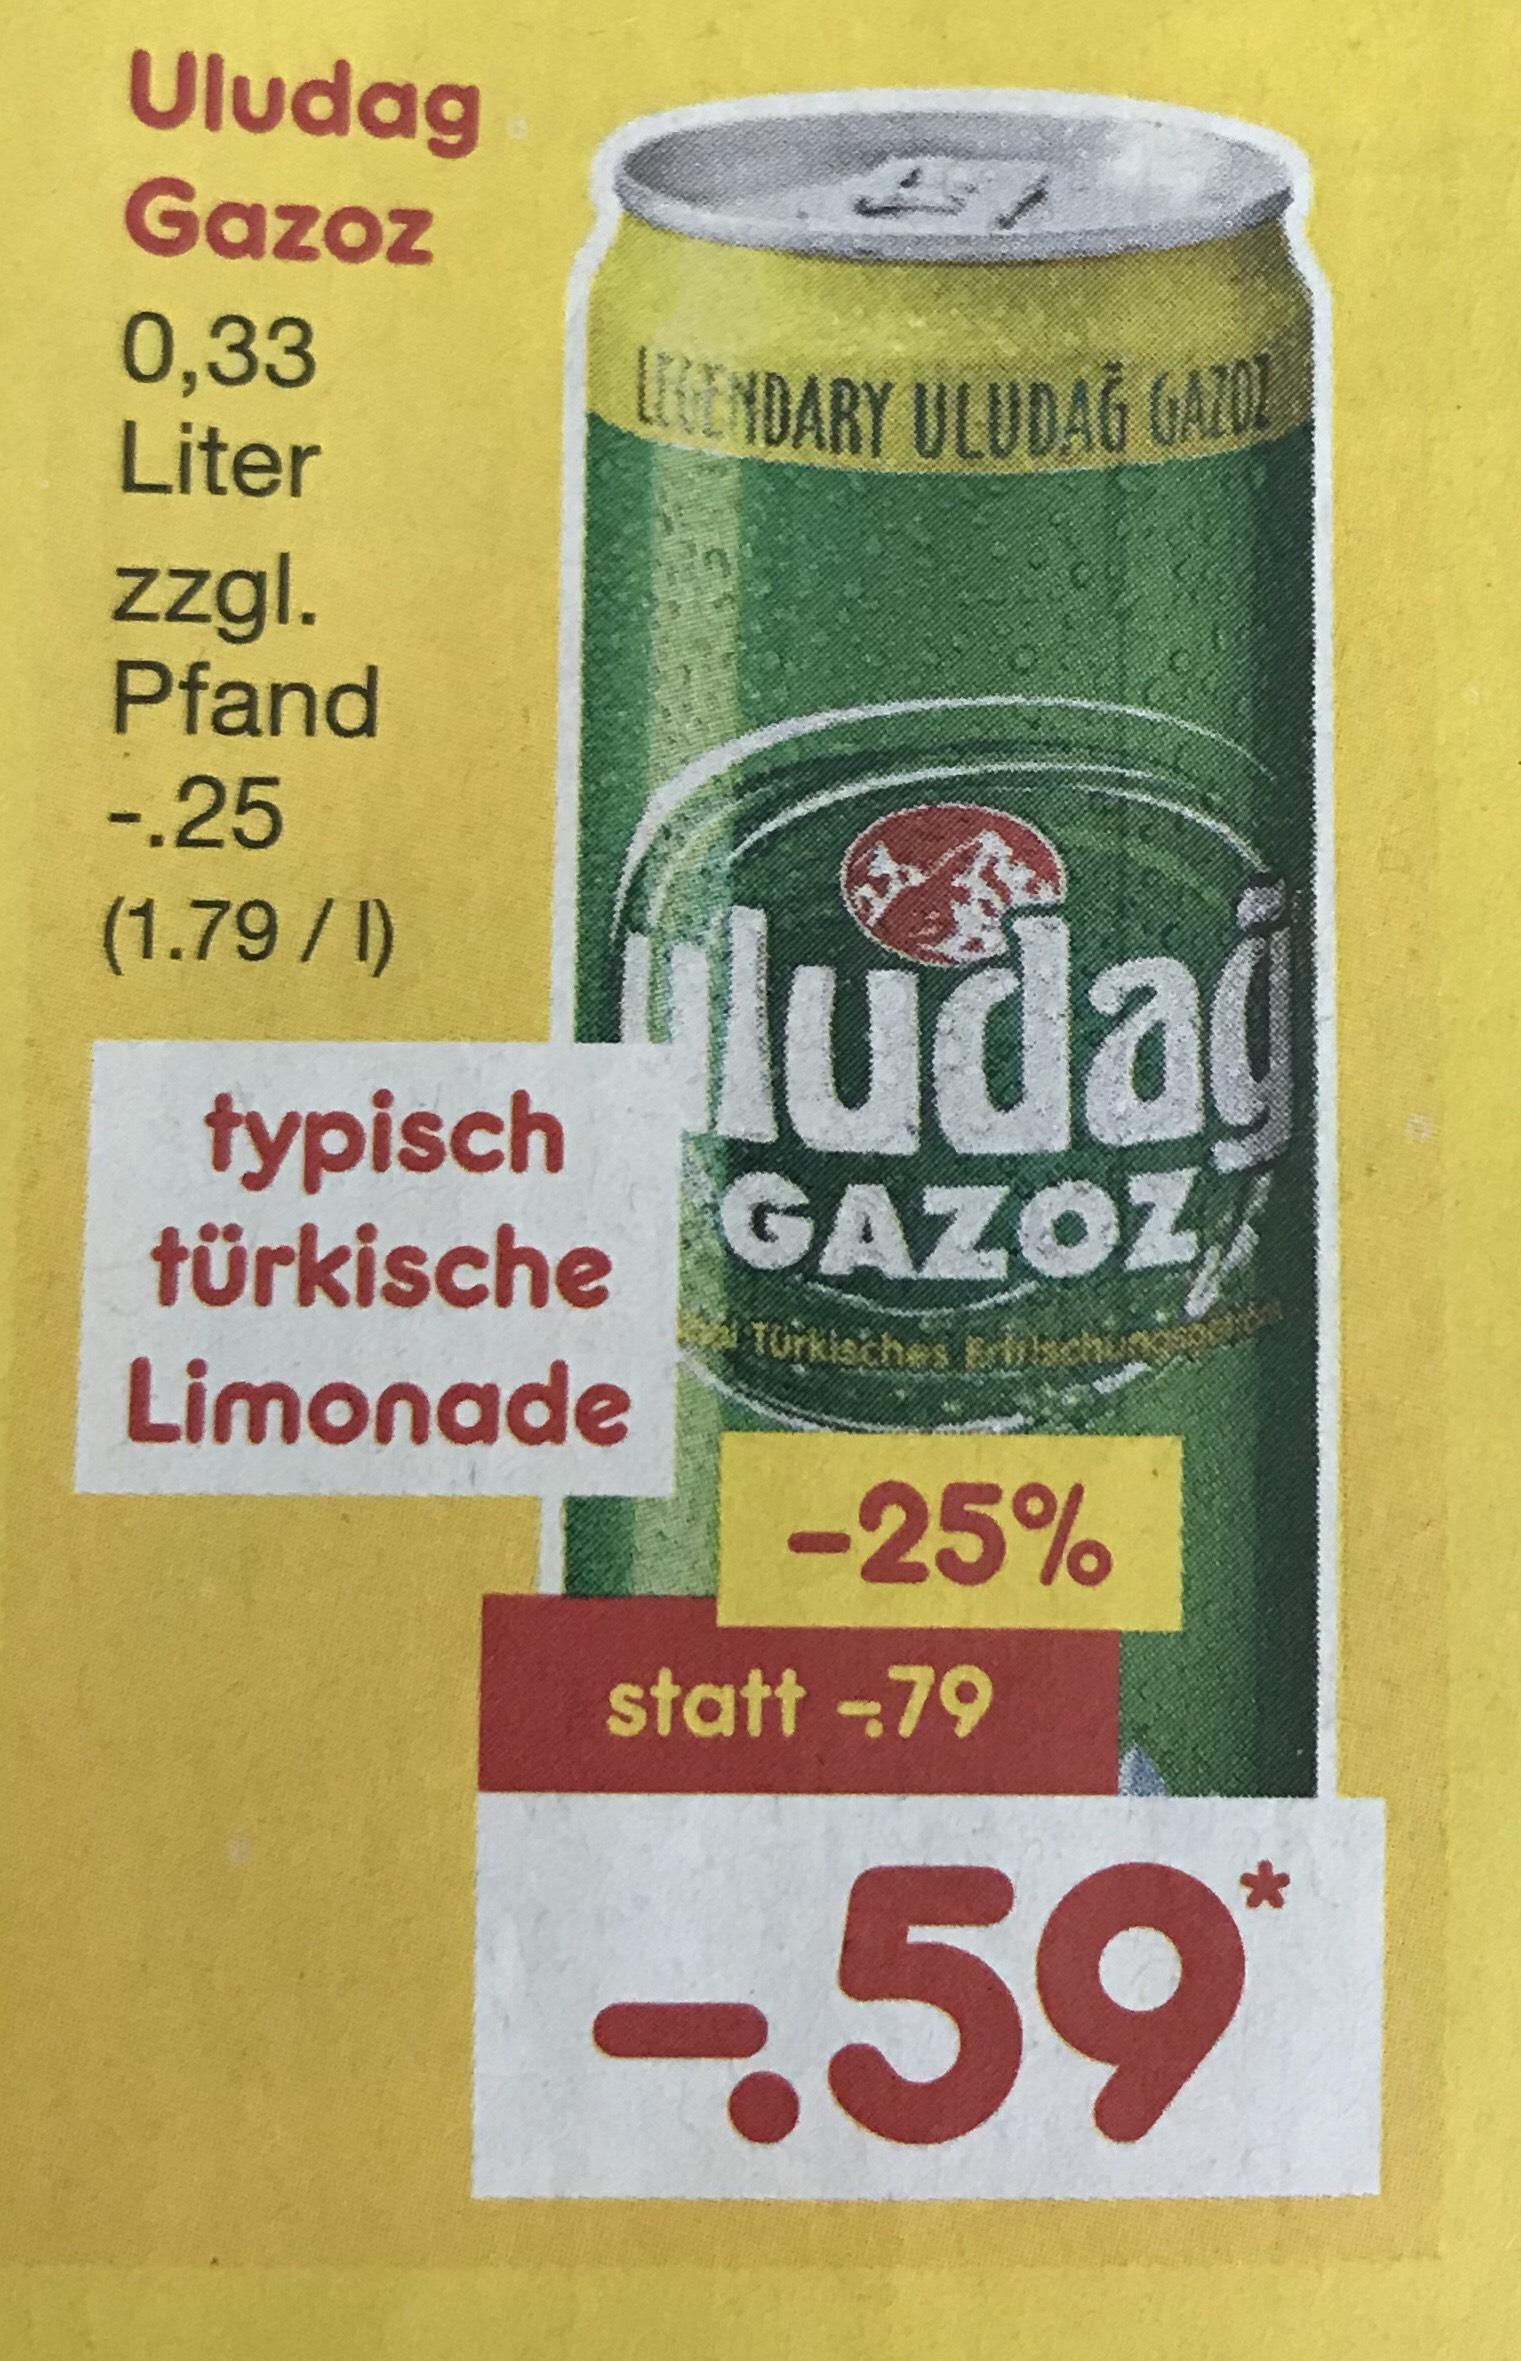 [Netto MD] Uludag Gazoz 0,33 für effektiv 0,48€ lokal Duisburg